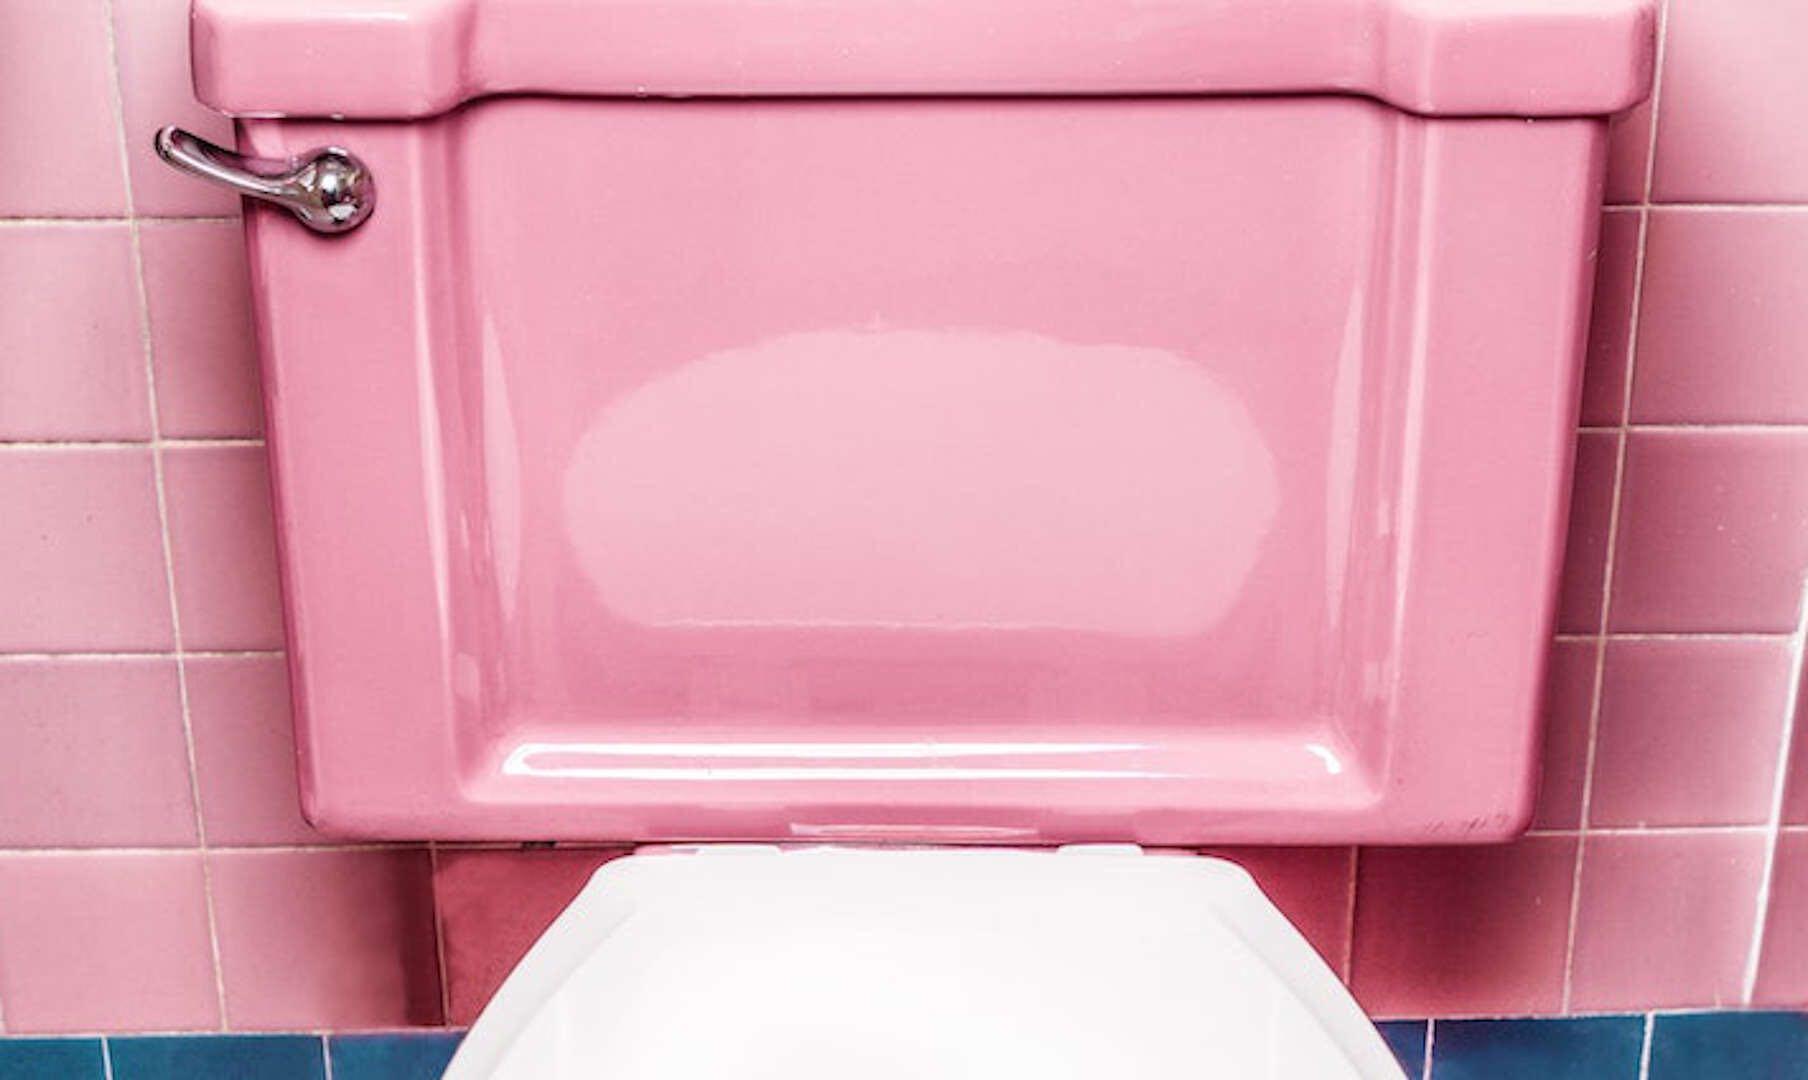 Plastikfreies Toilettenpapier